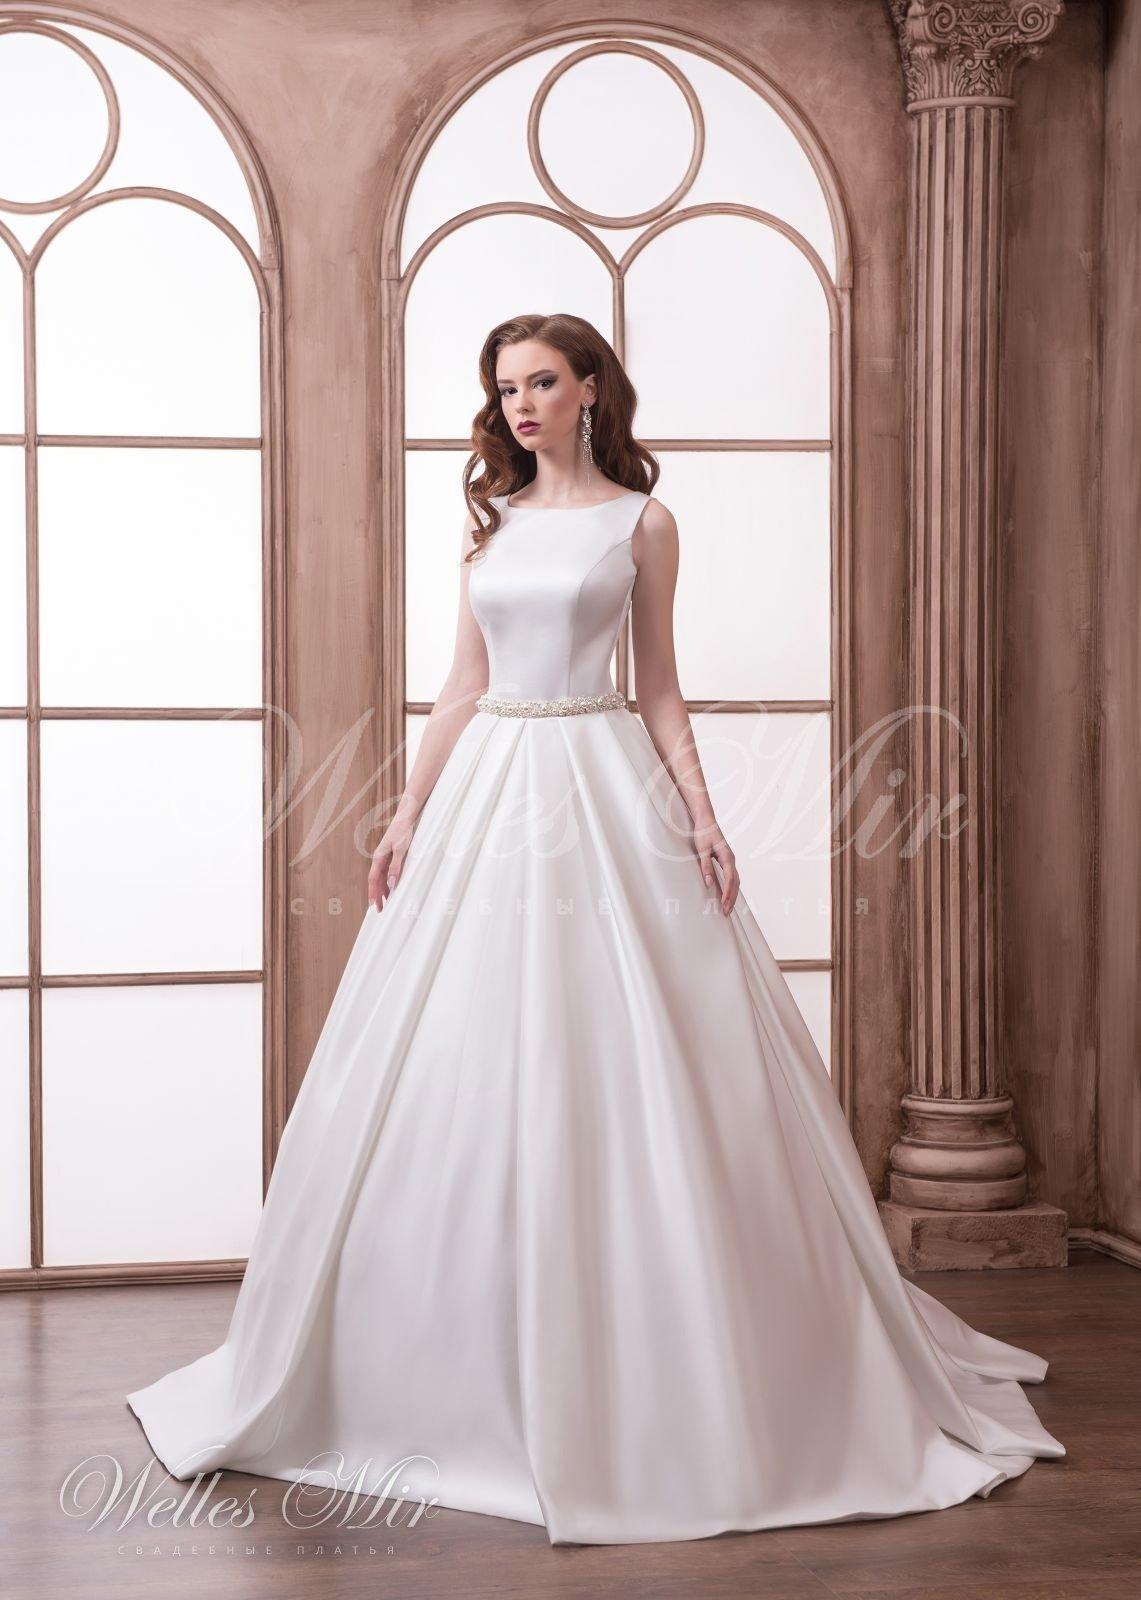 Smooth wedding dress